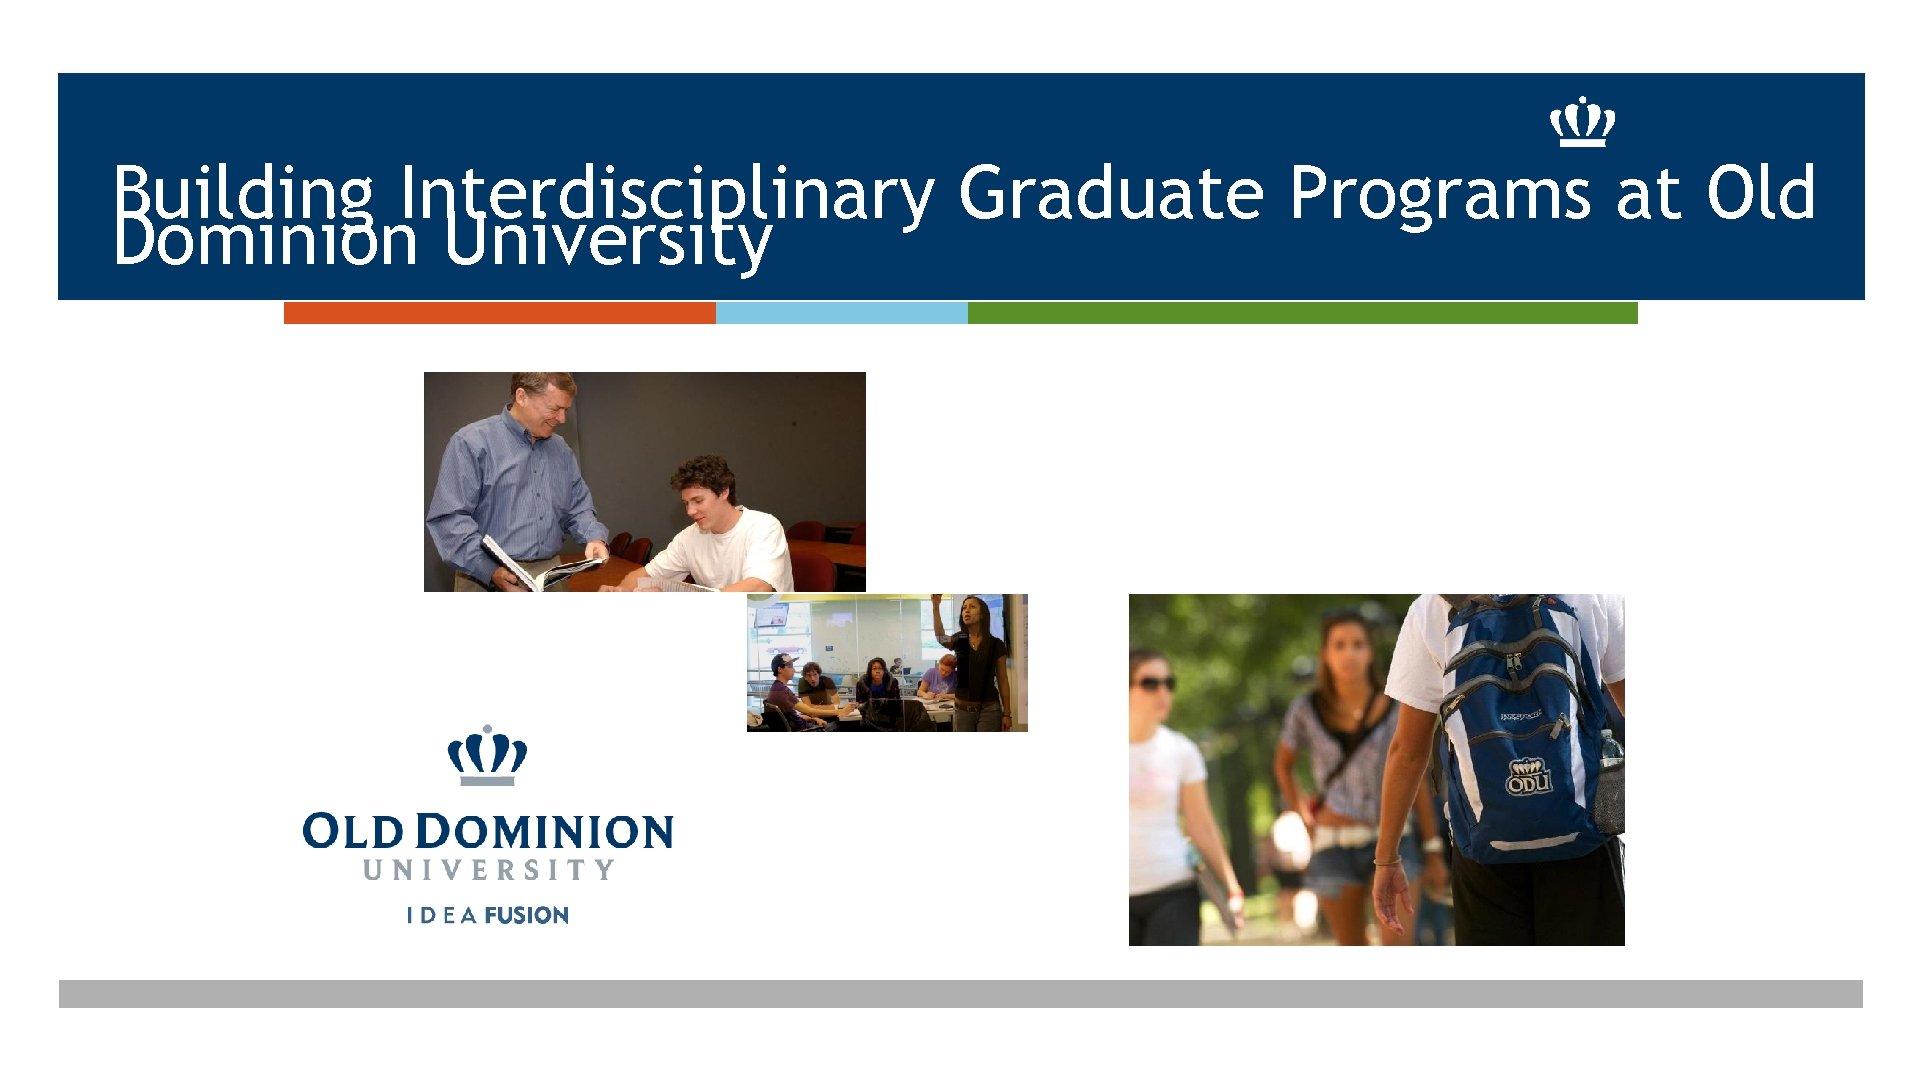 Building Interdisciplinary Graduate Programs at Old Dominion University